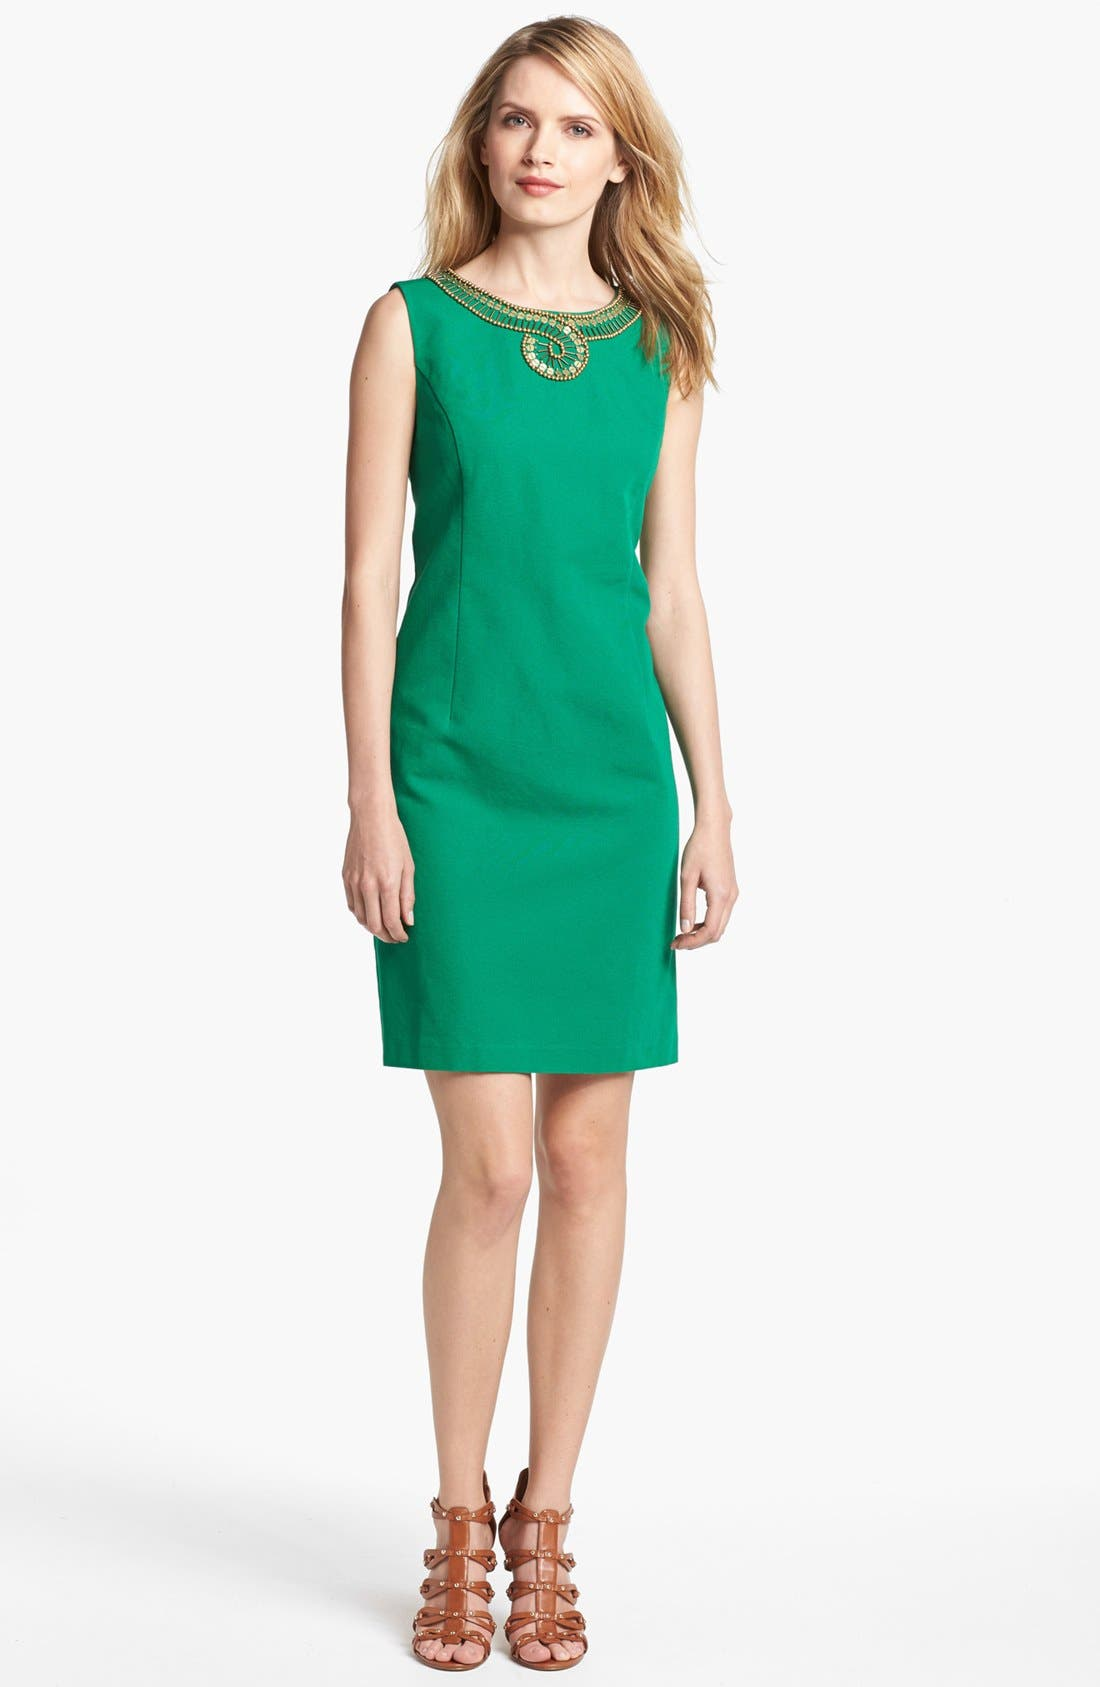 Alternate Image 1 Selected - Ellen Tracy Embellished Cotton Sheath Dress